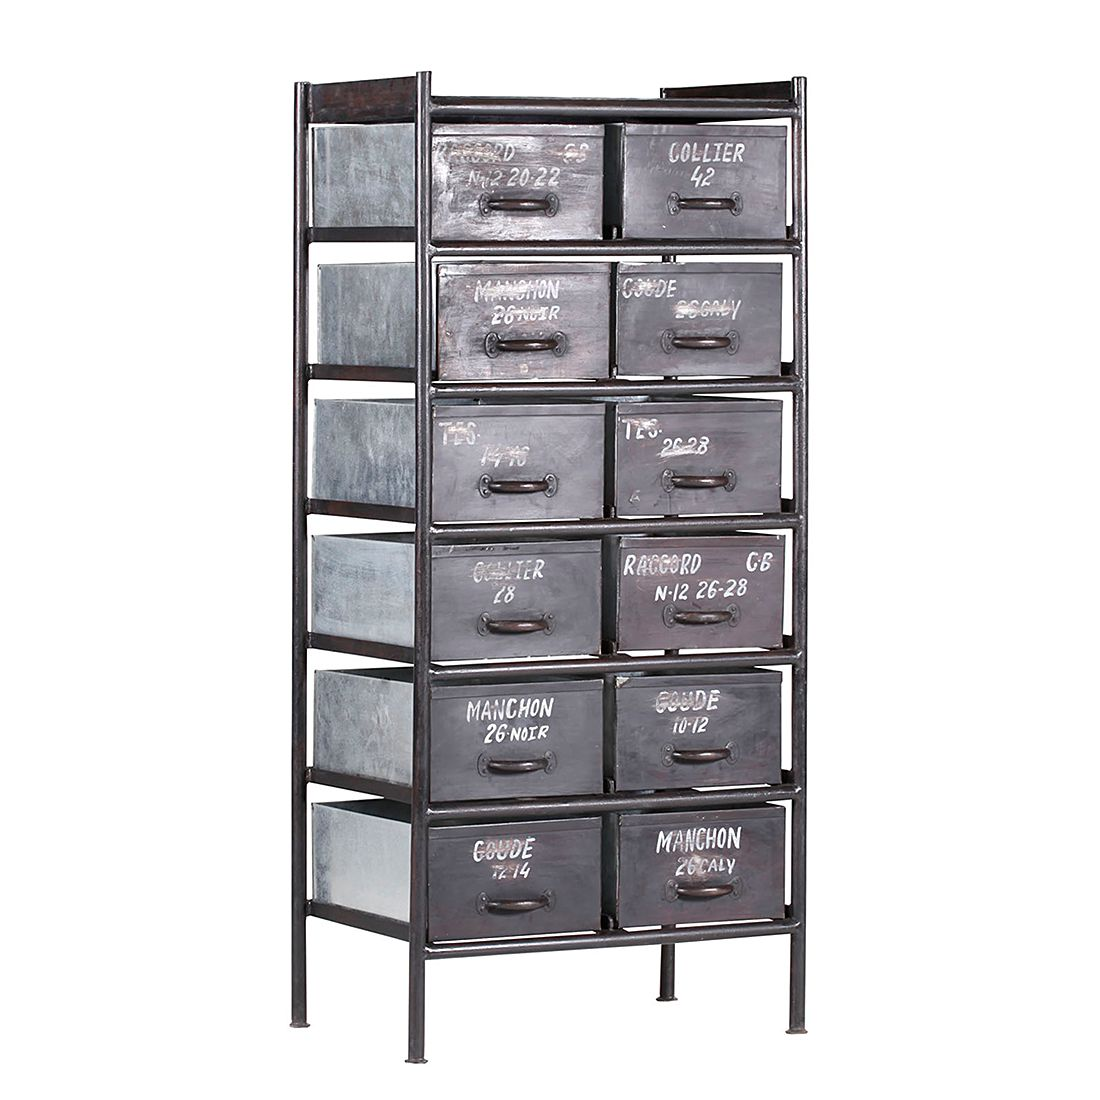 kommode aus metall g nstig kaufen. Black Bedroom Furniture Sets. Home Design Ideas